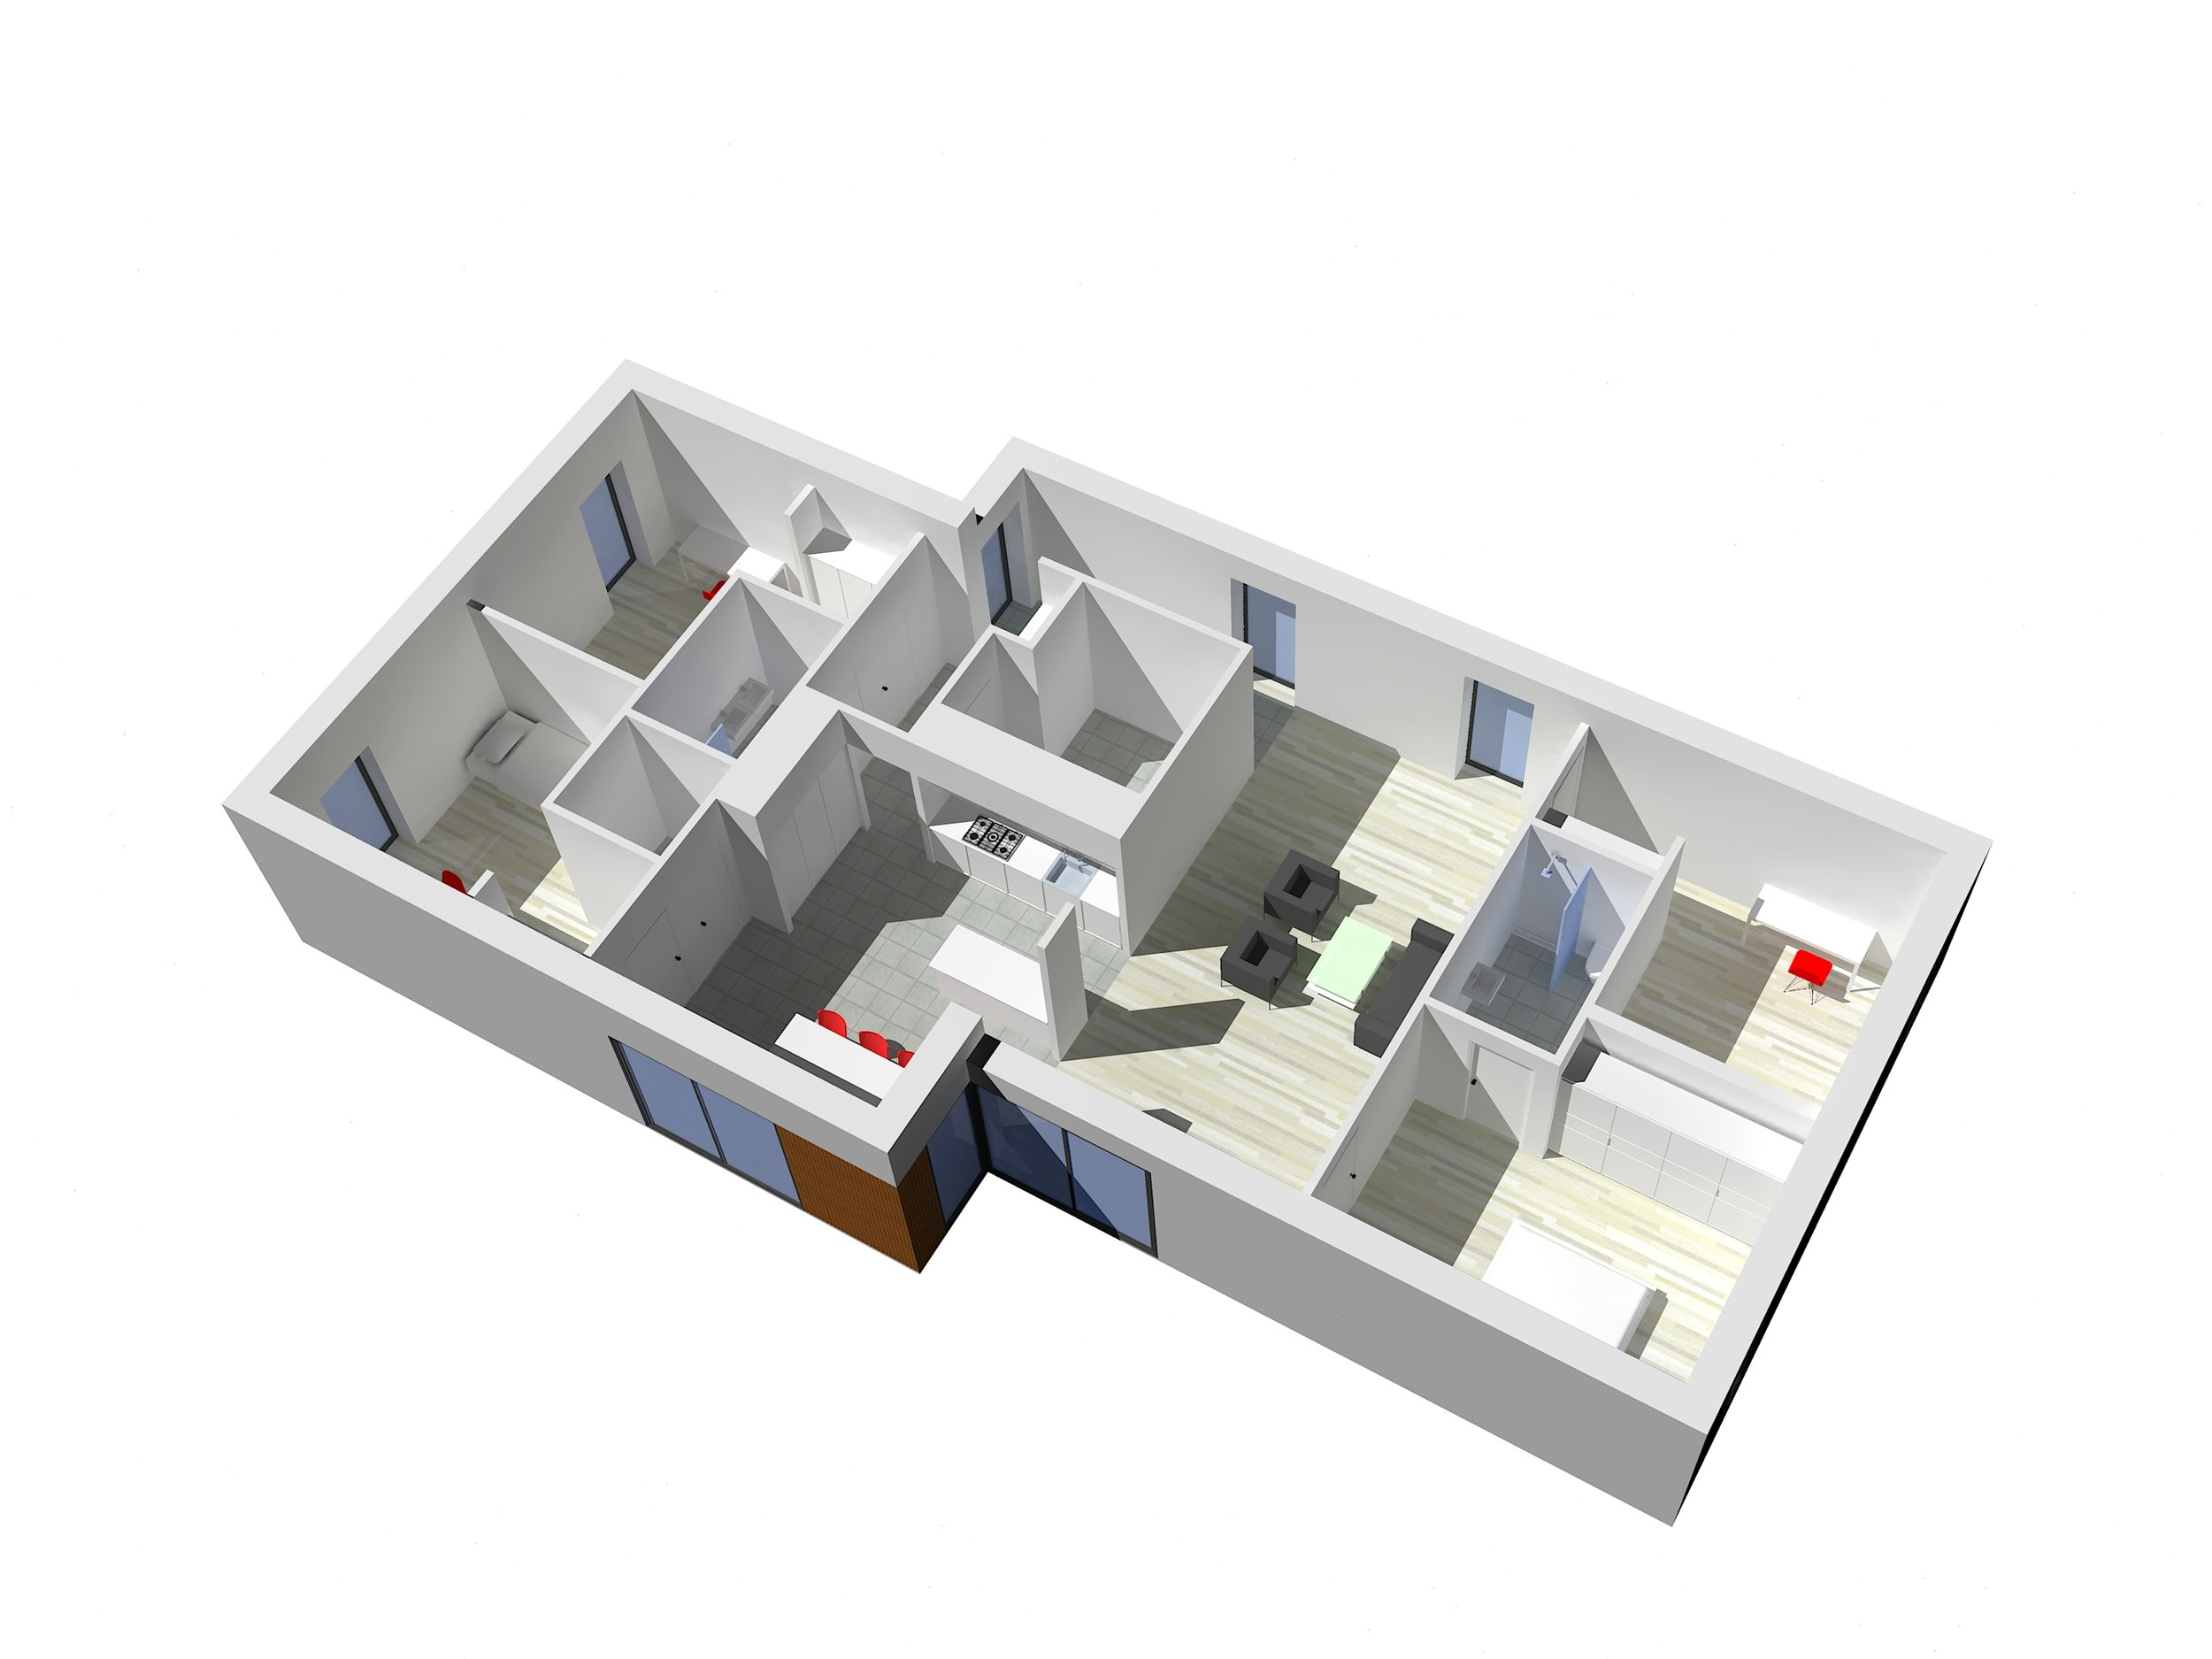 r4 new house.jpg